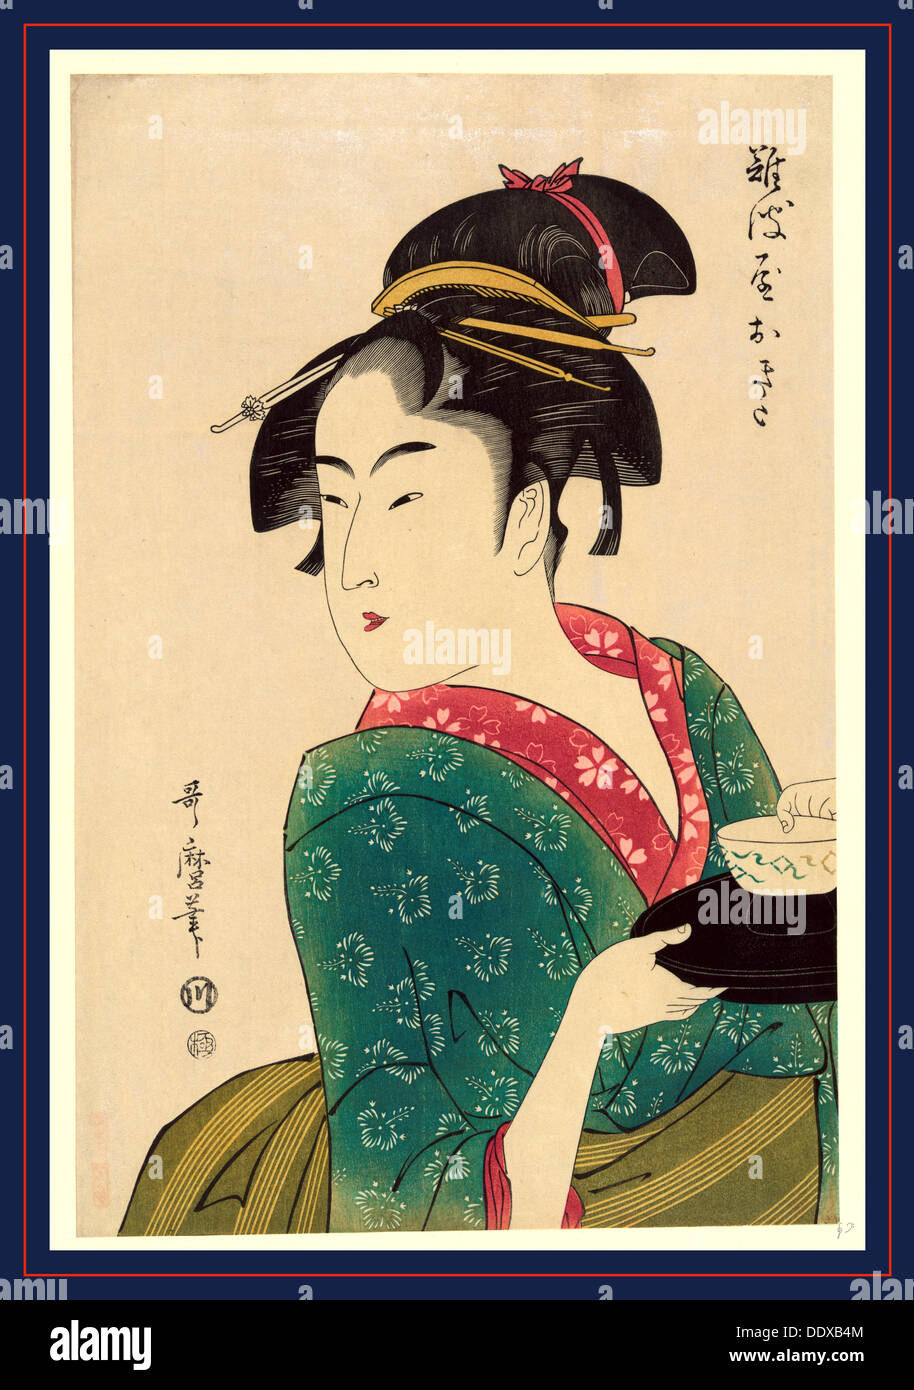 Naniwaya okita, Okita de Naniwa-ya. [1793], 1 imprimir posteriormente imprimir : xilografía, color, impresión muestra Naniwaya Okita Imagen De Stock